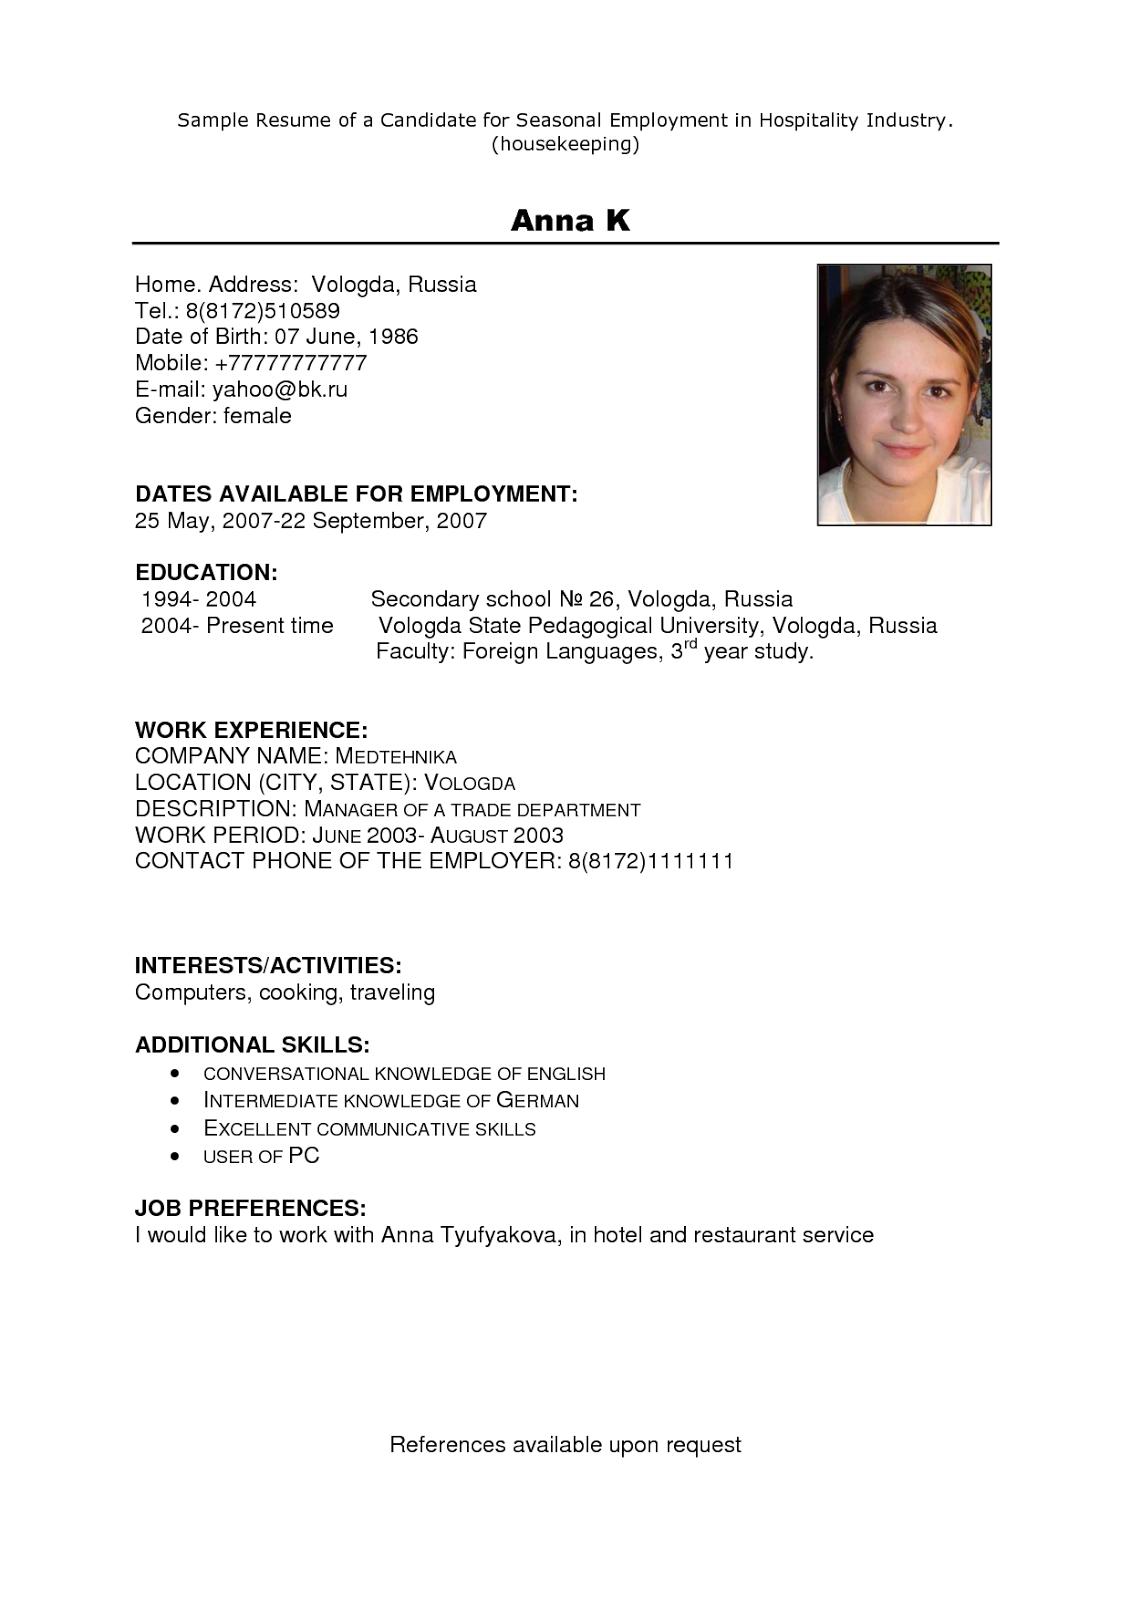 basic resume format service resume basic resume format resume basic format ebook database resume format sample for job application